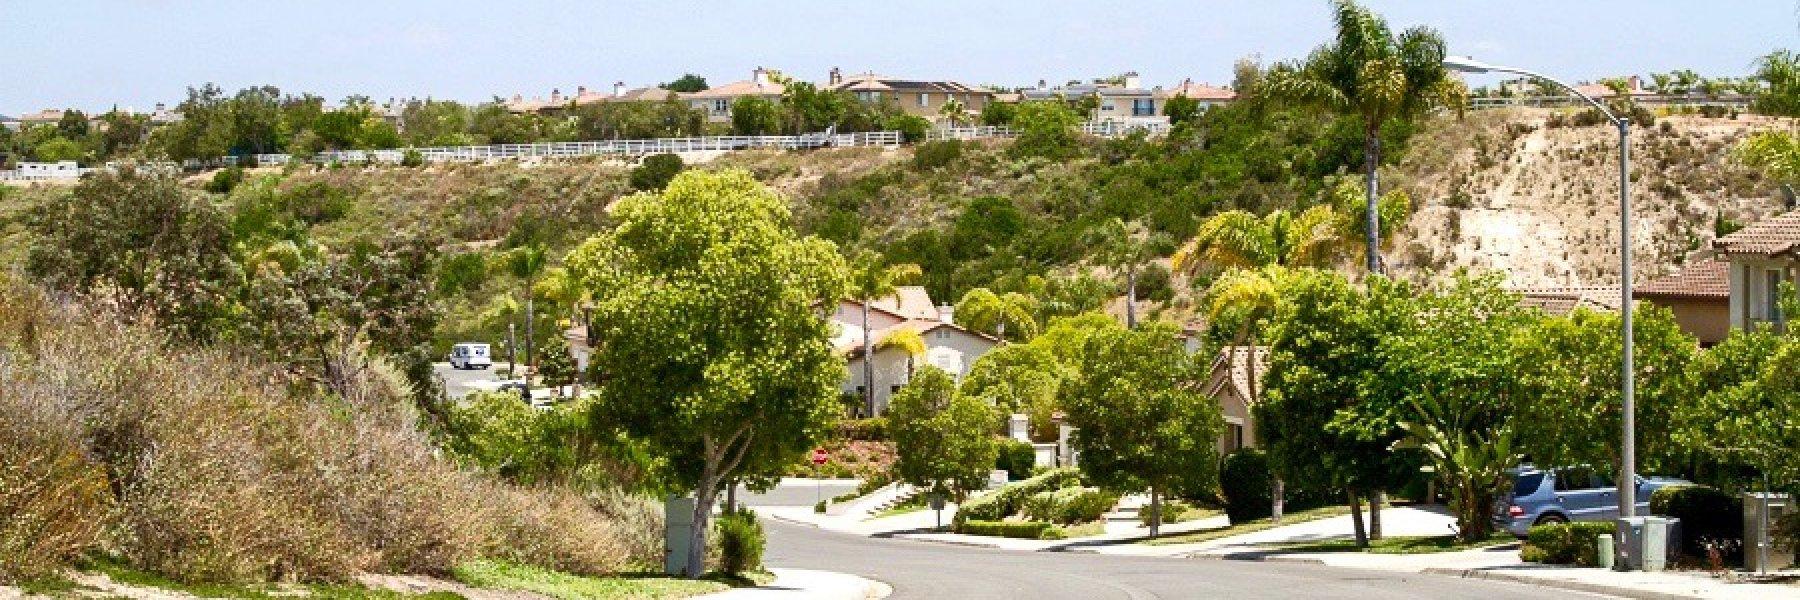 Ashley Falls is a community of homes in San Diego California